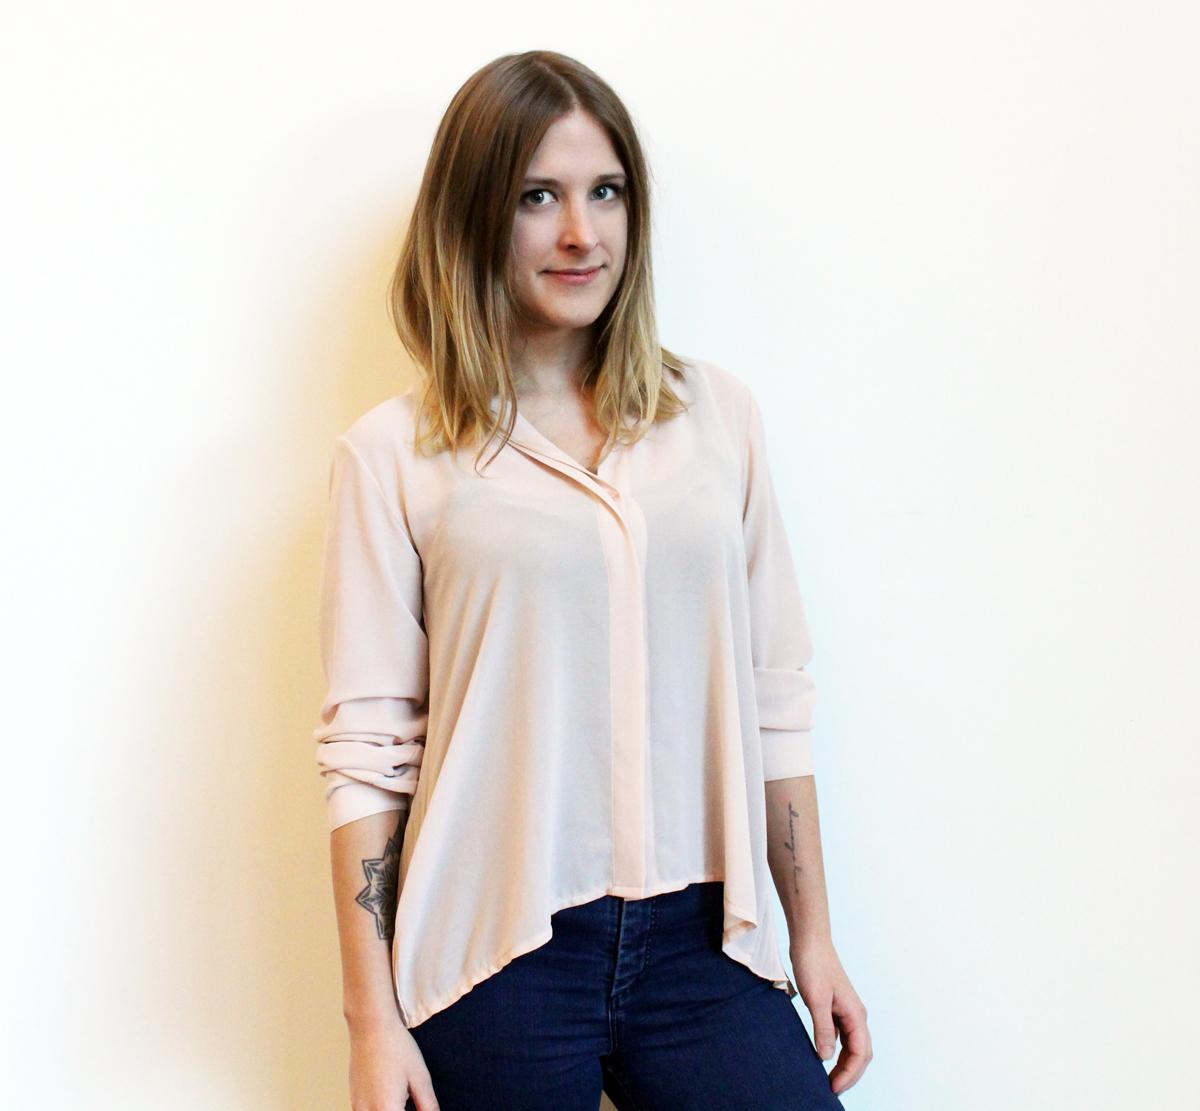 Jana Bröcker